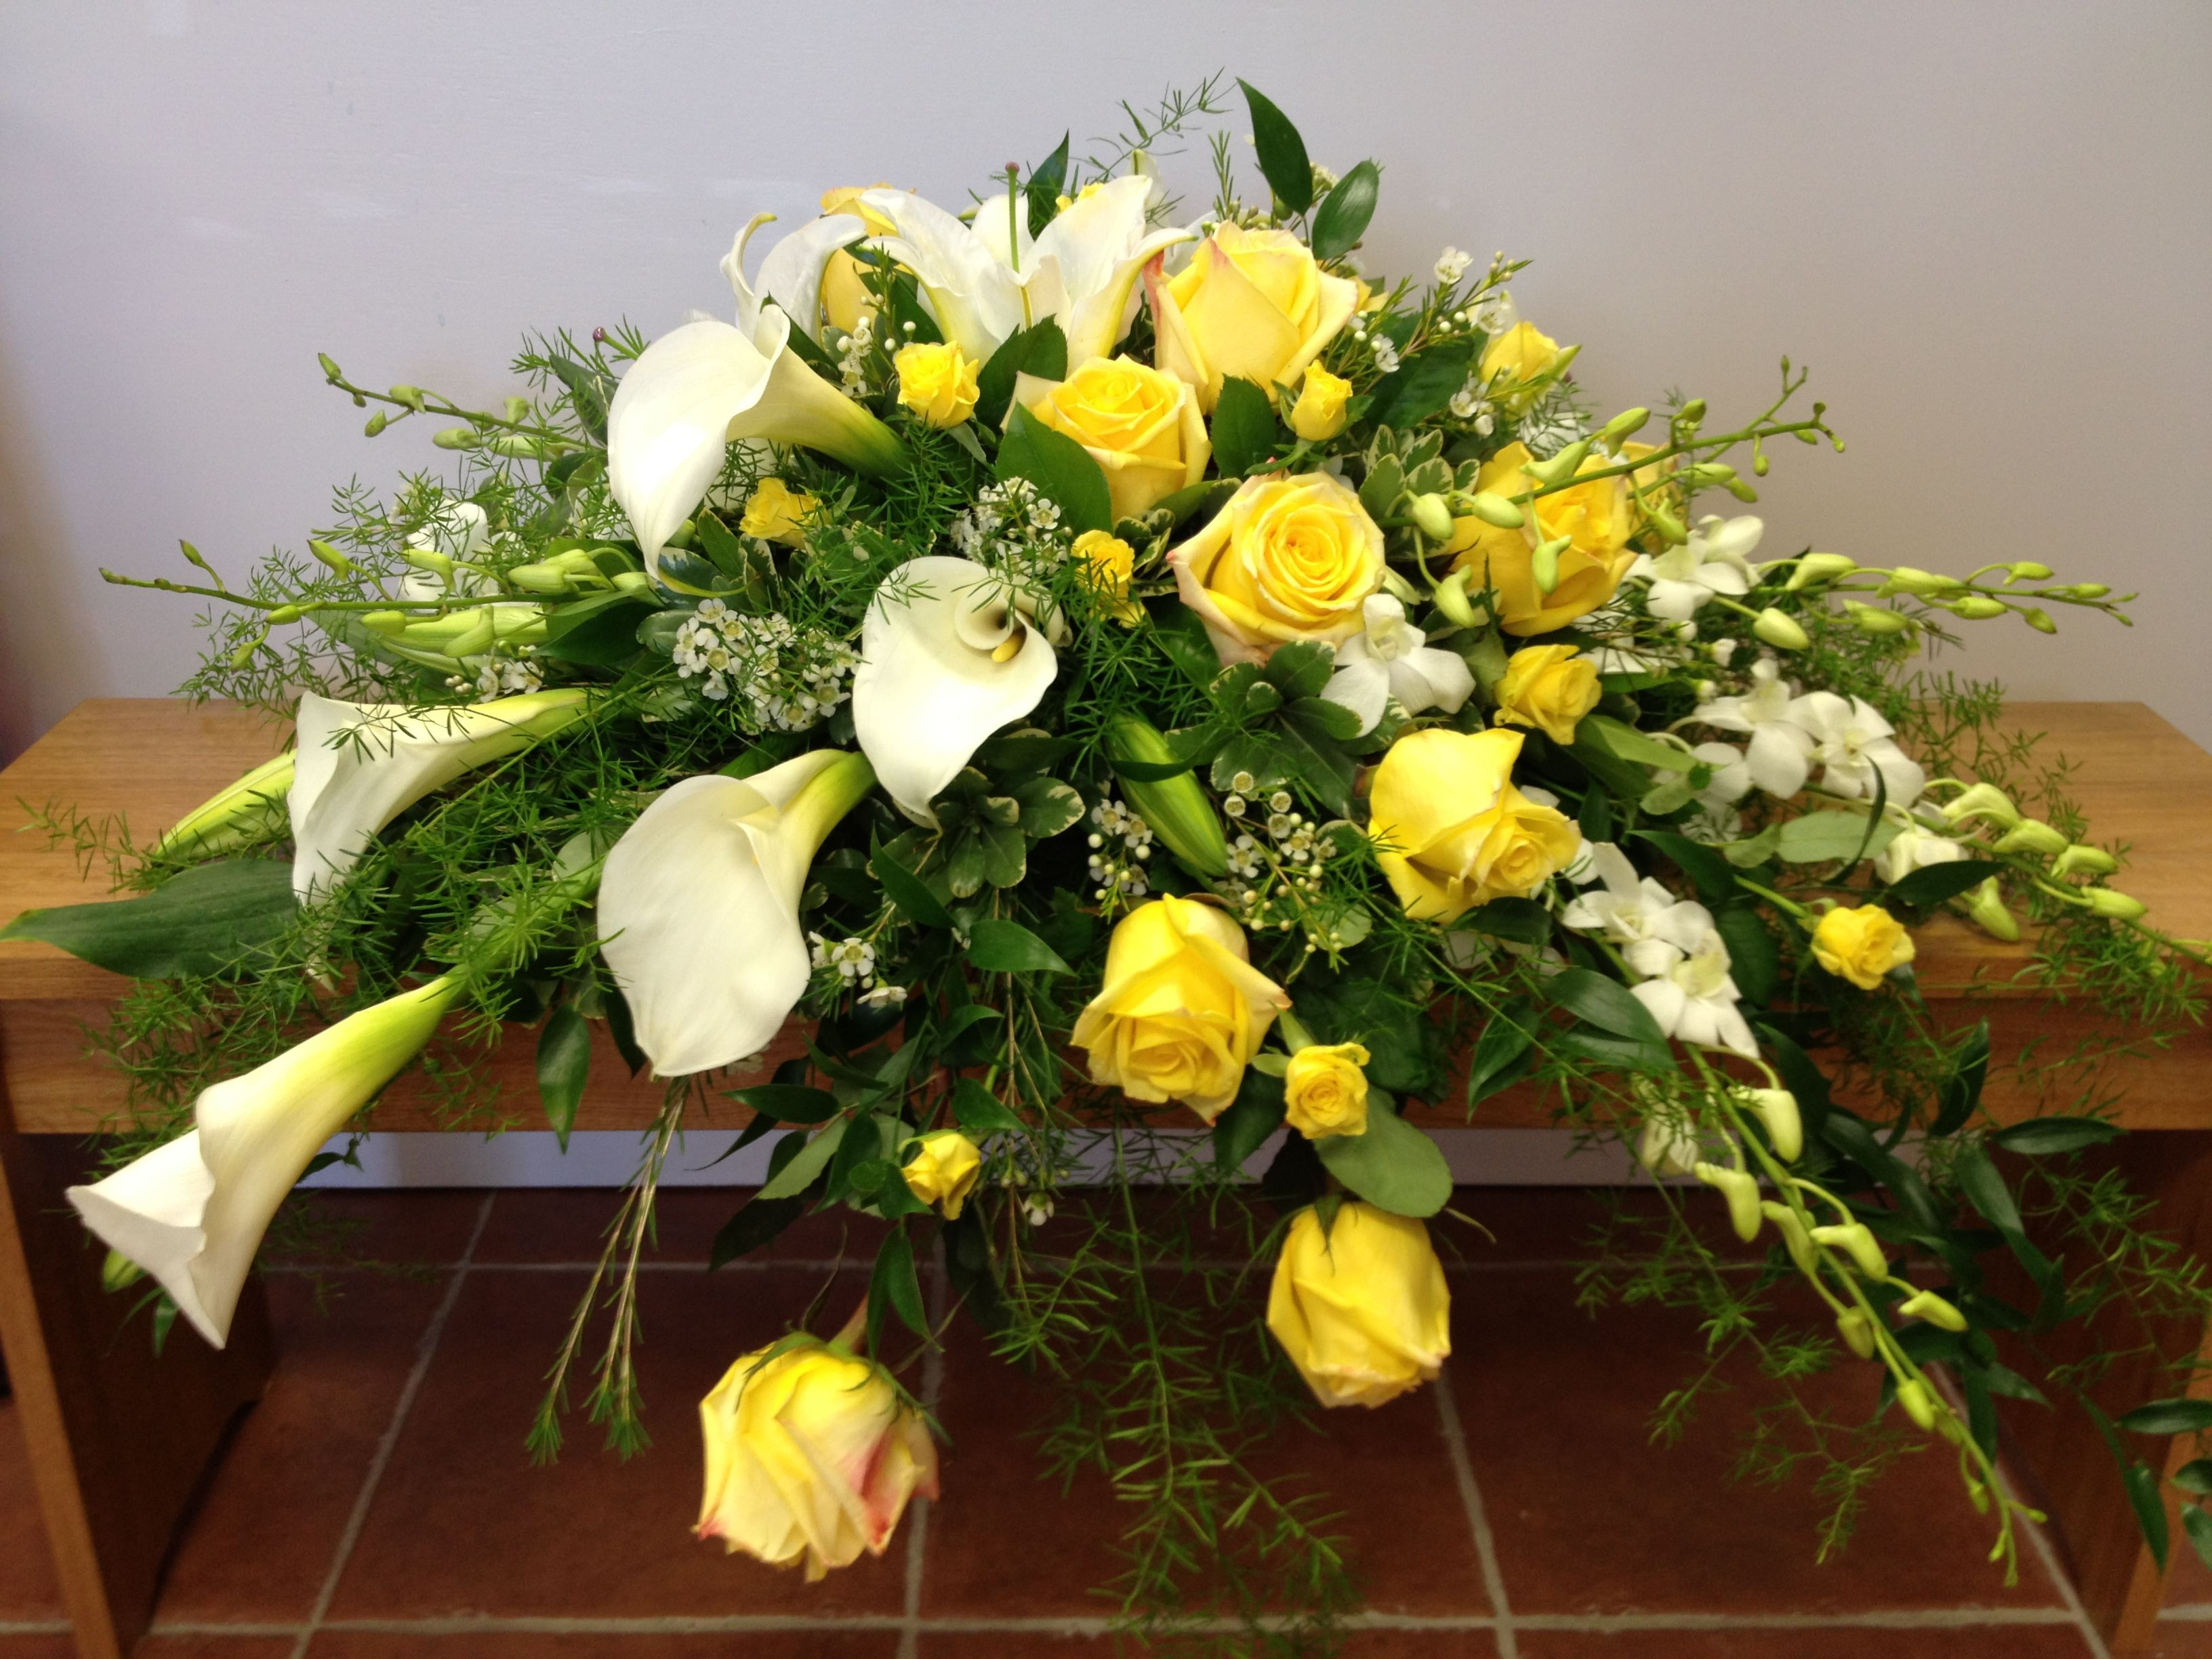 Sympathy designs sprays flower and funeral casket flowers izmirmasajfo Gallery